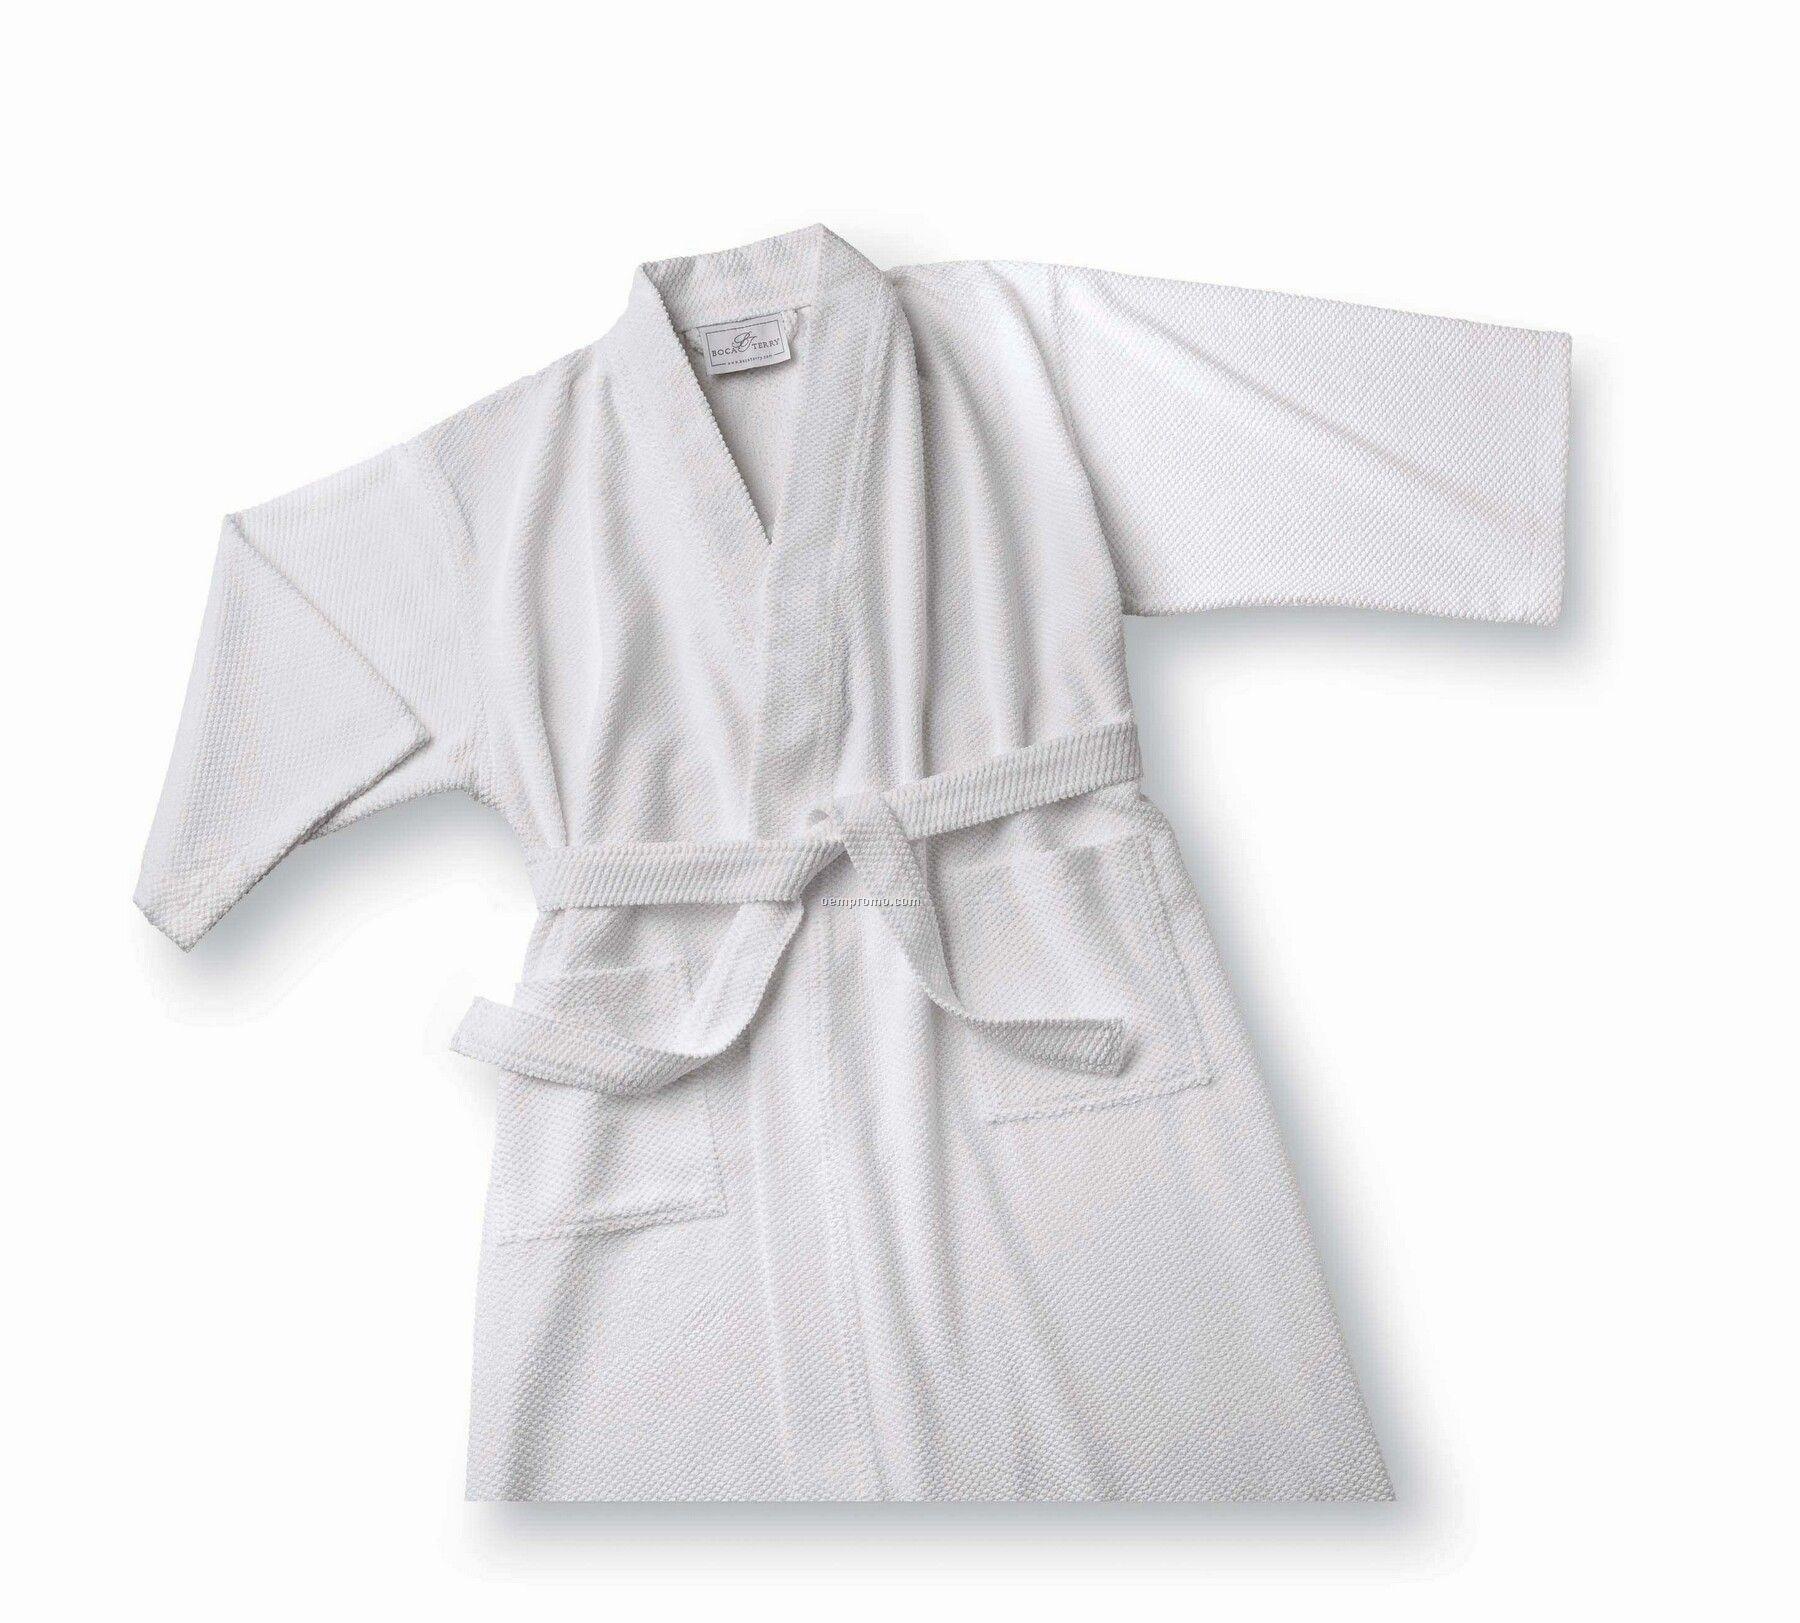 Microtec Kimono Pineapple Check Robe